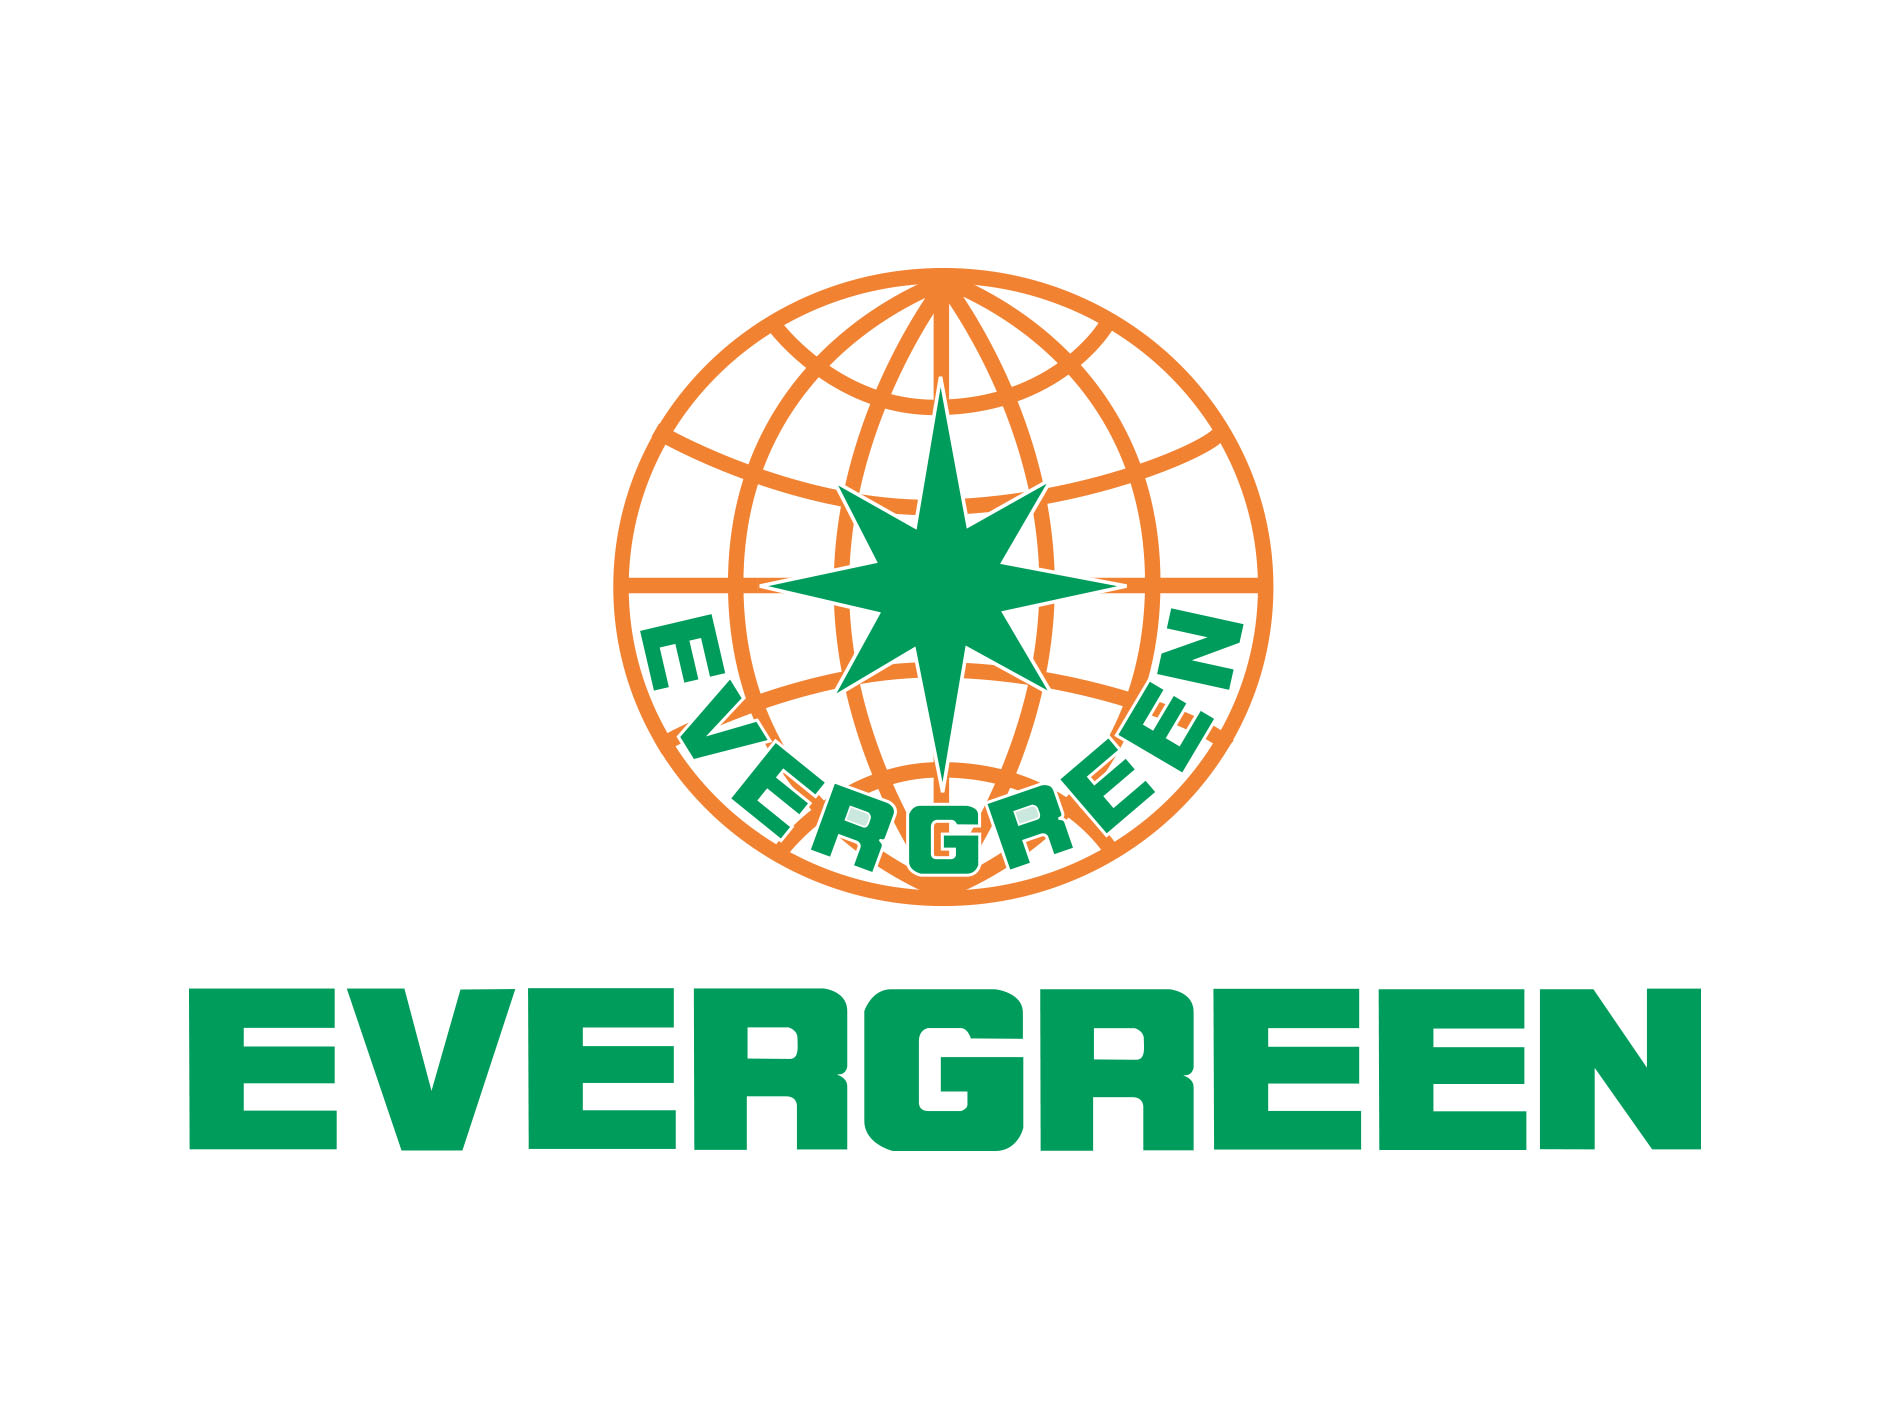 Client freight azerbaijan HOME Evergreen